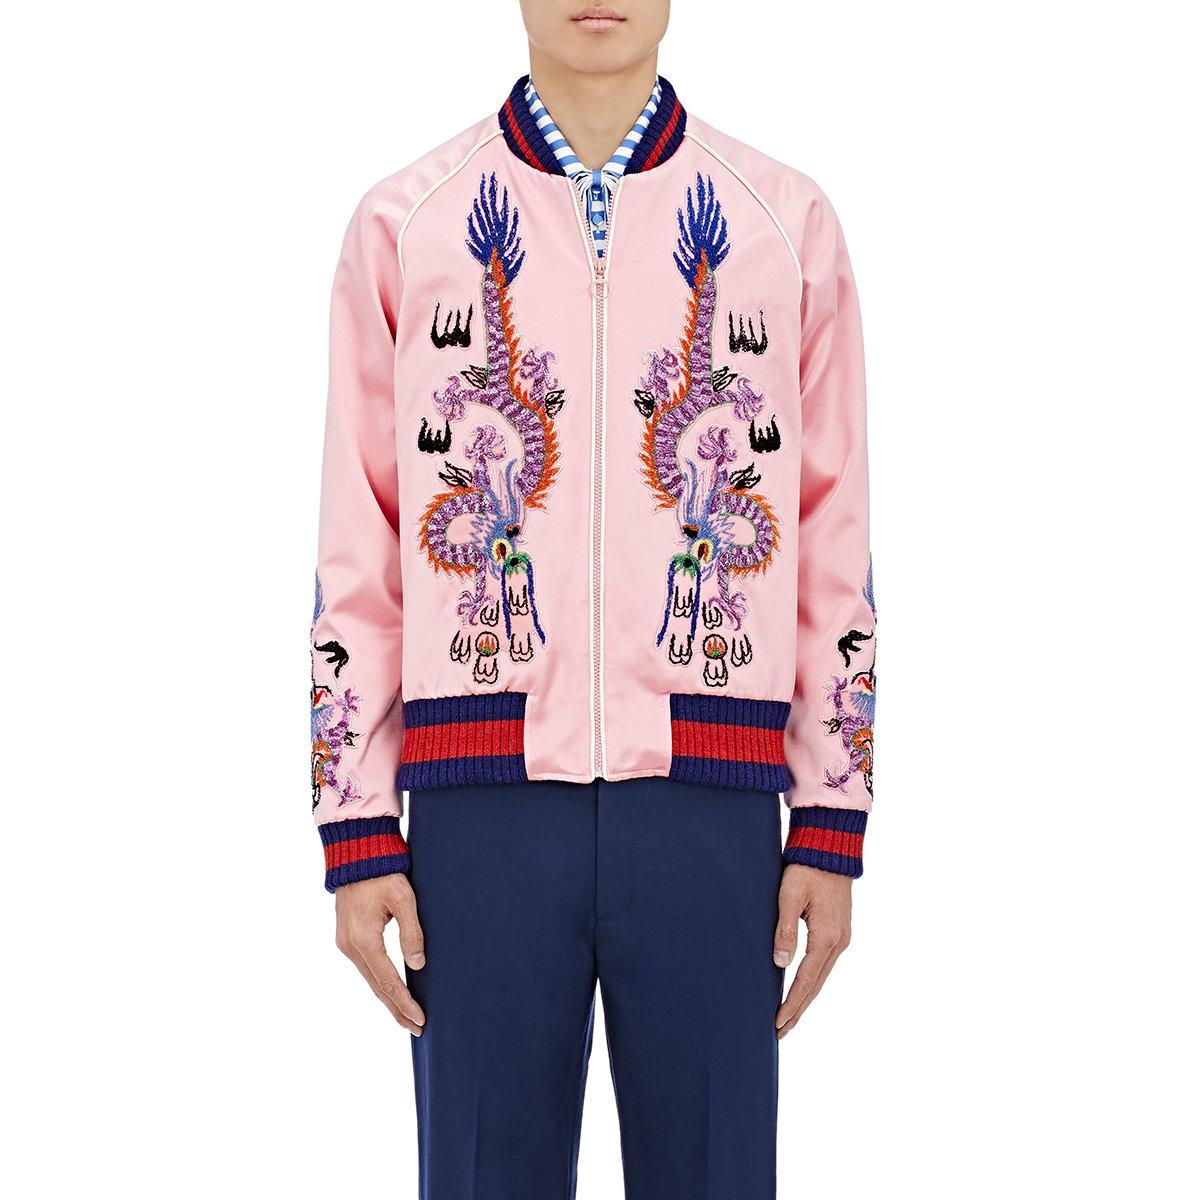 330d22347 Gucci l'aveugle Par Amour Silk Satin Duchesse Bomber Jacket in Pink ...